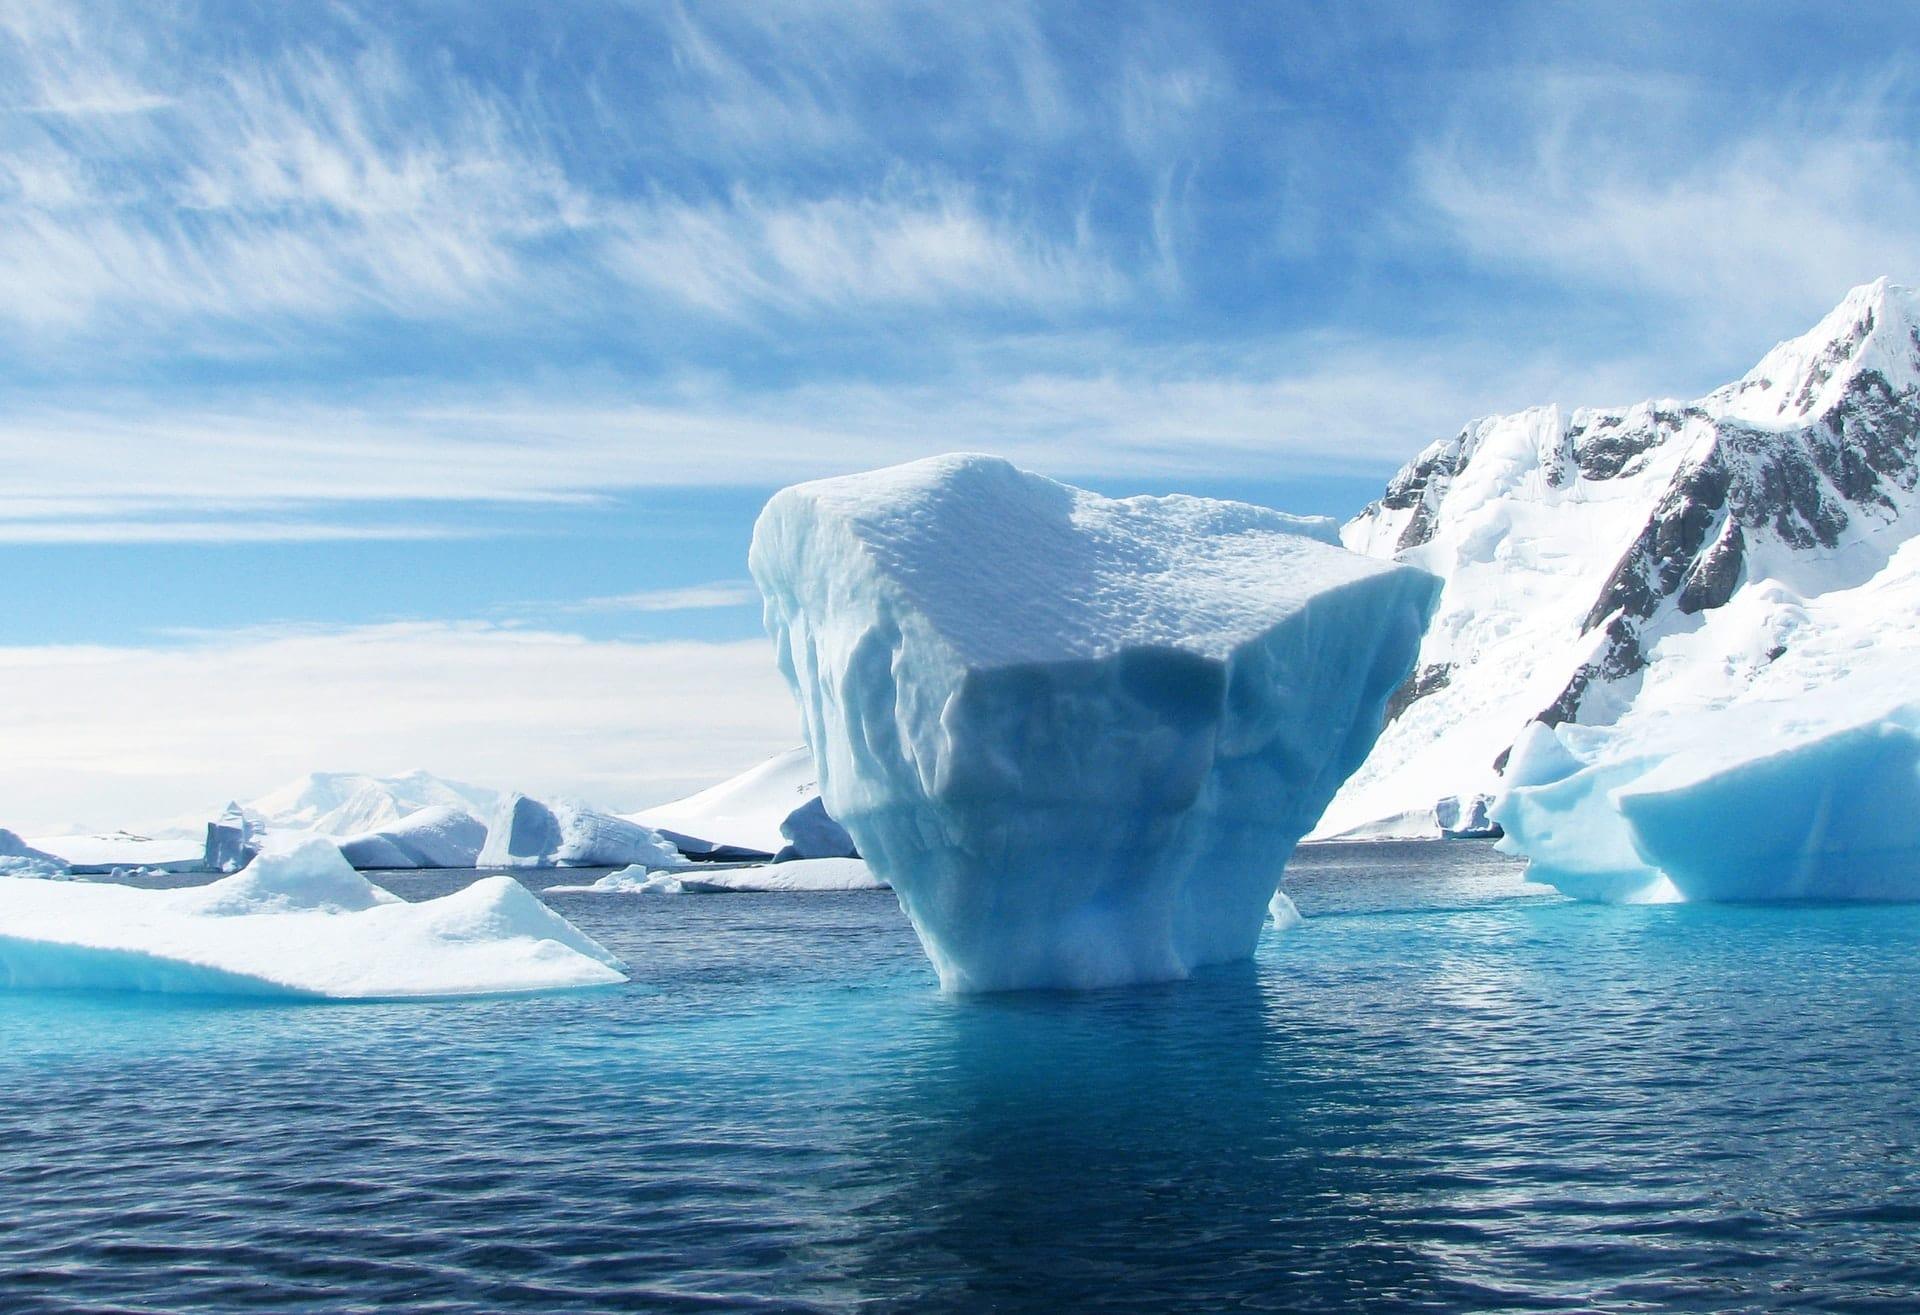 iceberg-antarctica-polar-blue-53389